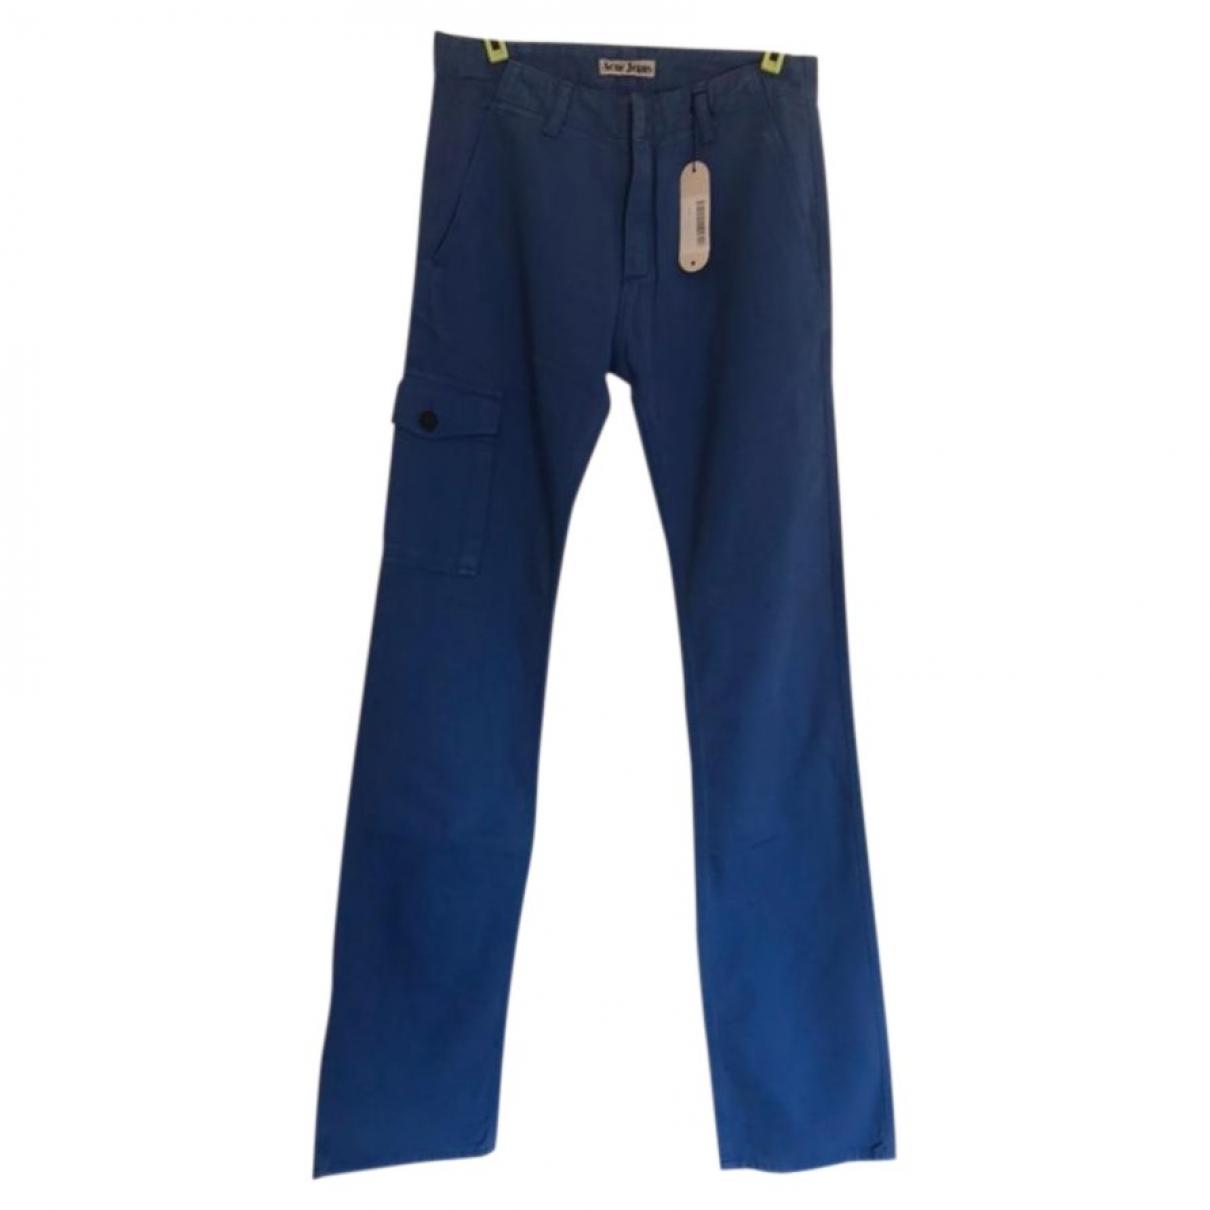 Acne Studios \N Blue Cotton Trousers for Men S International